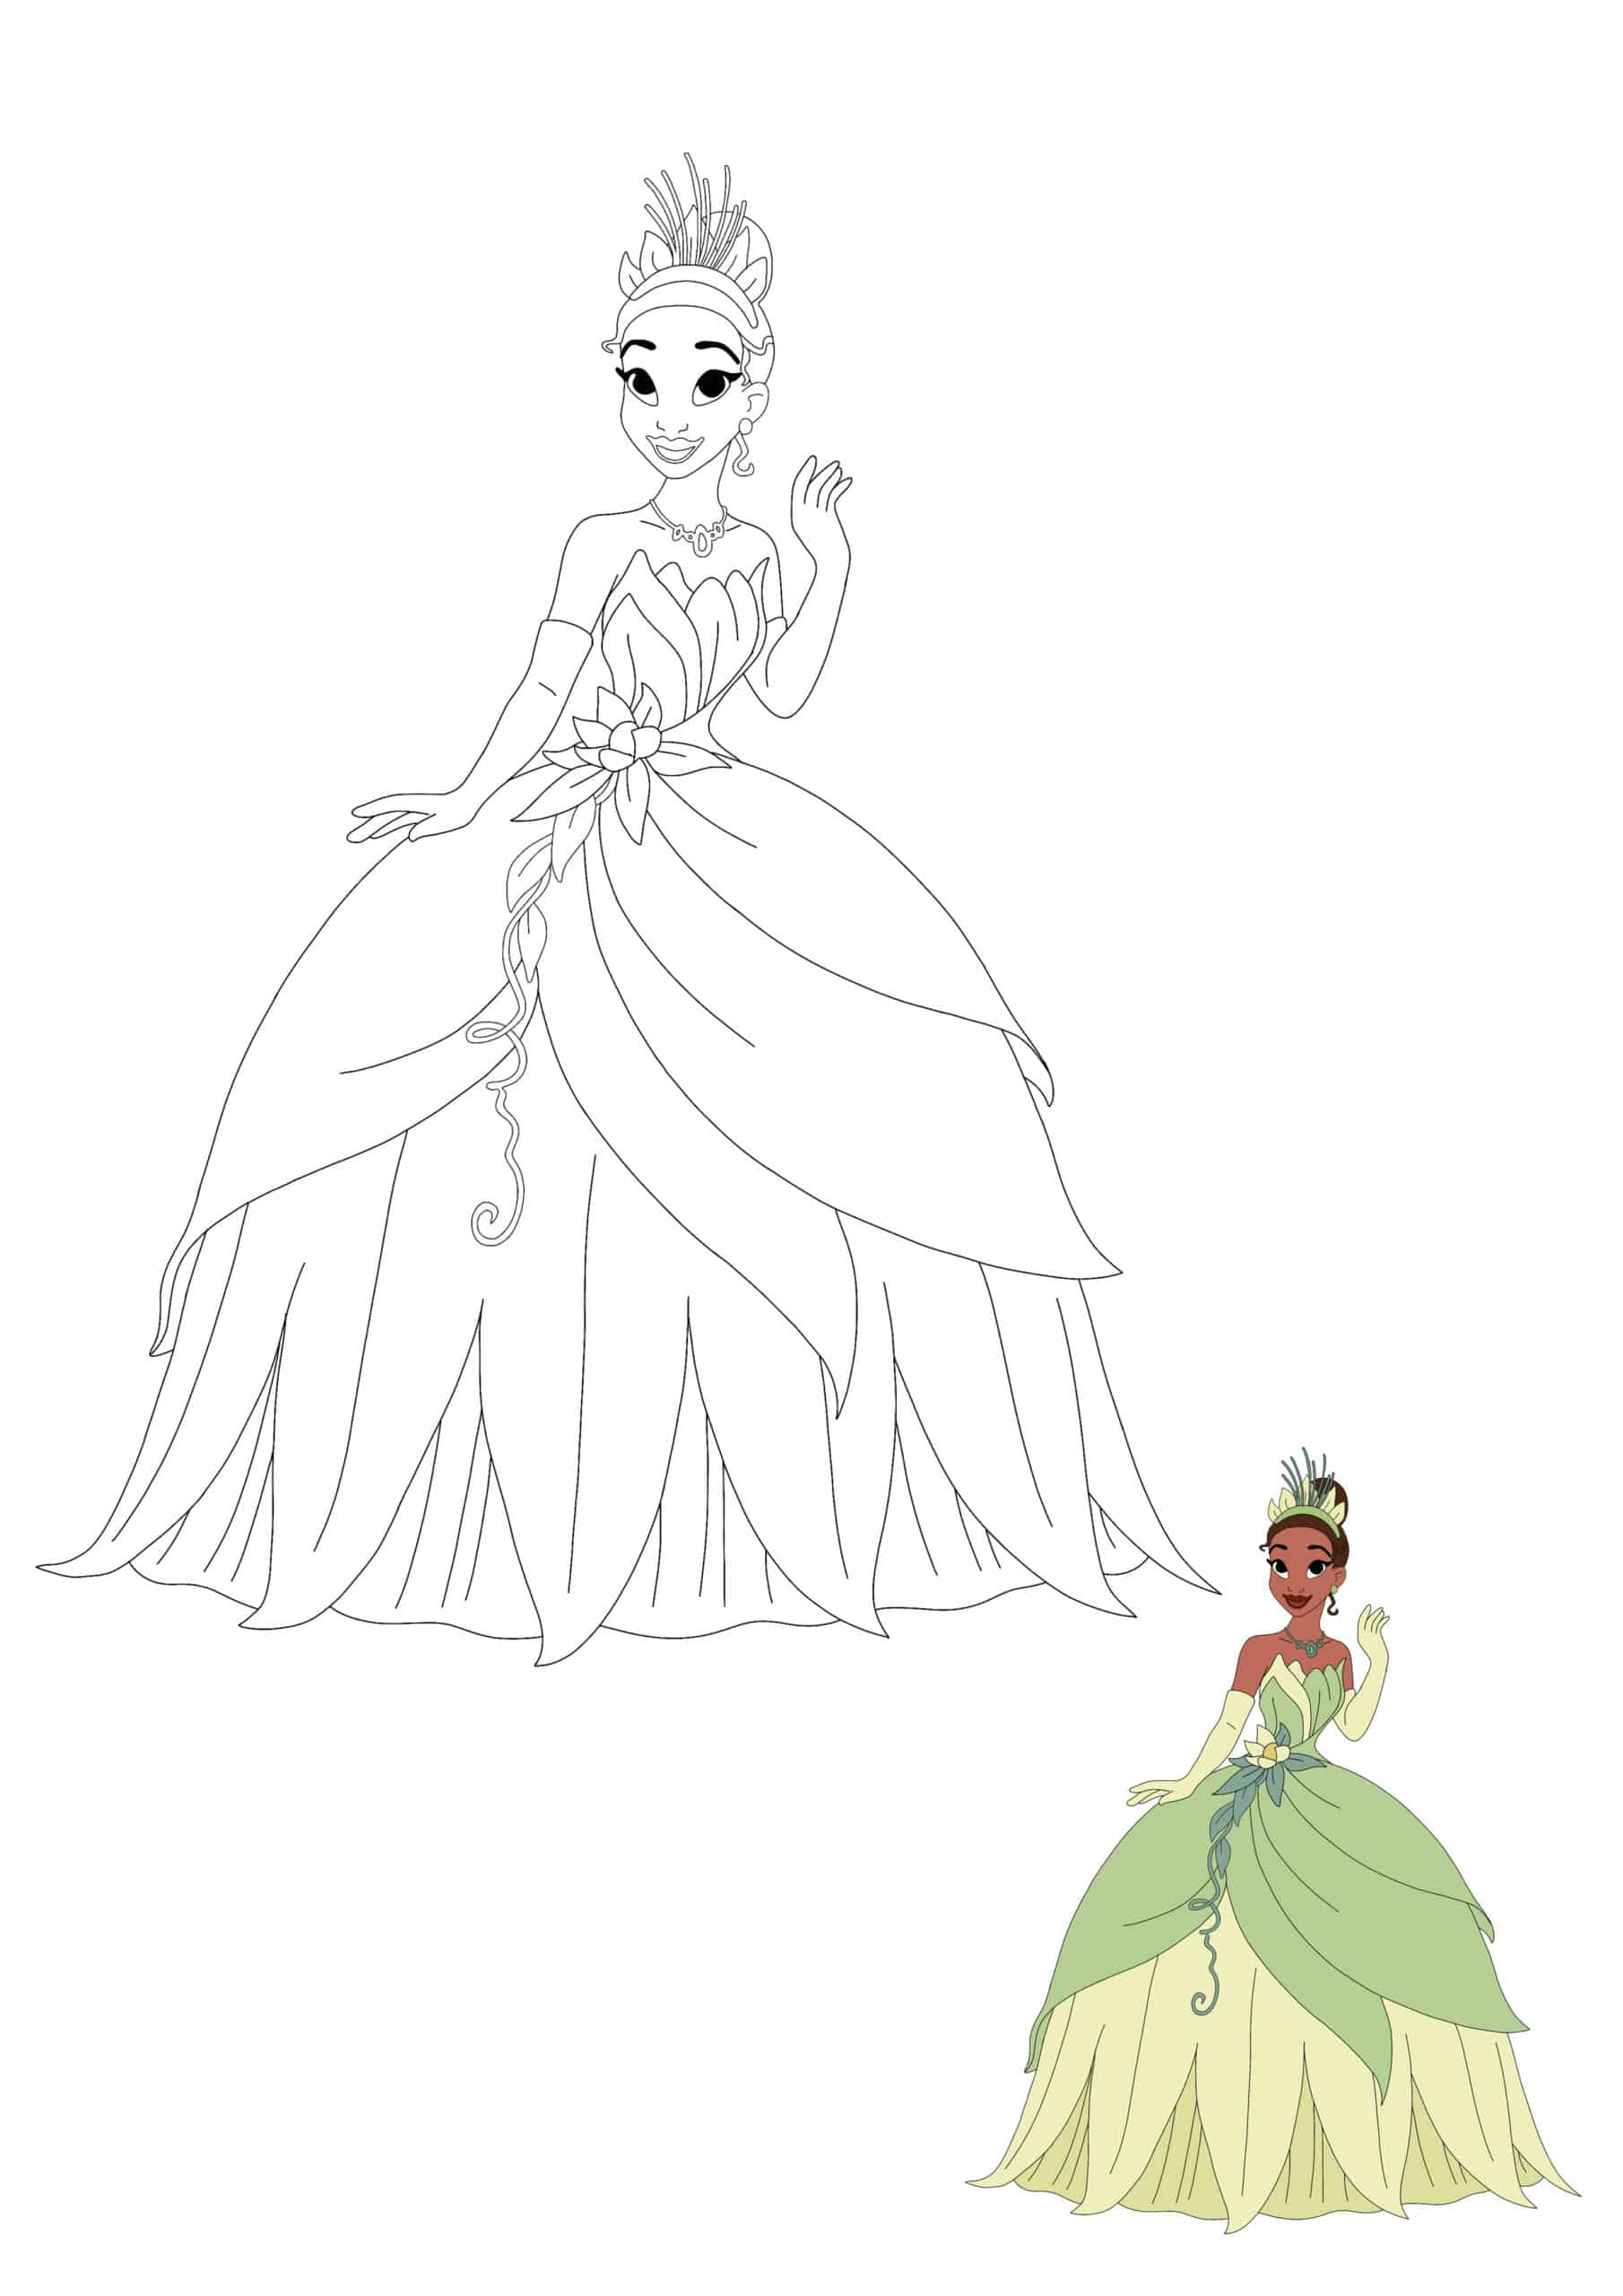 Princess Tiana coloring page for kids